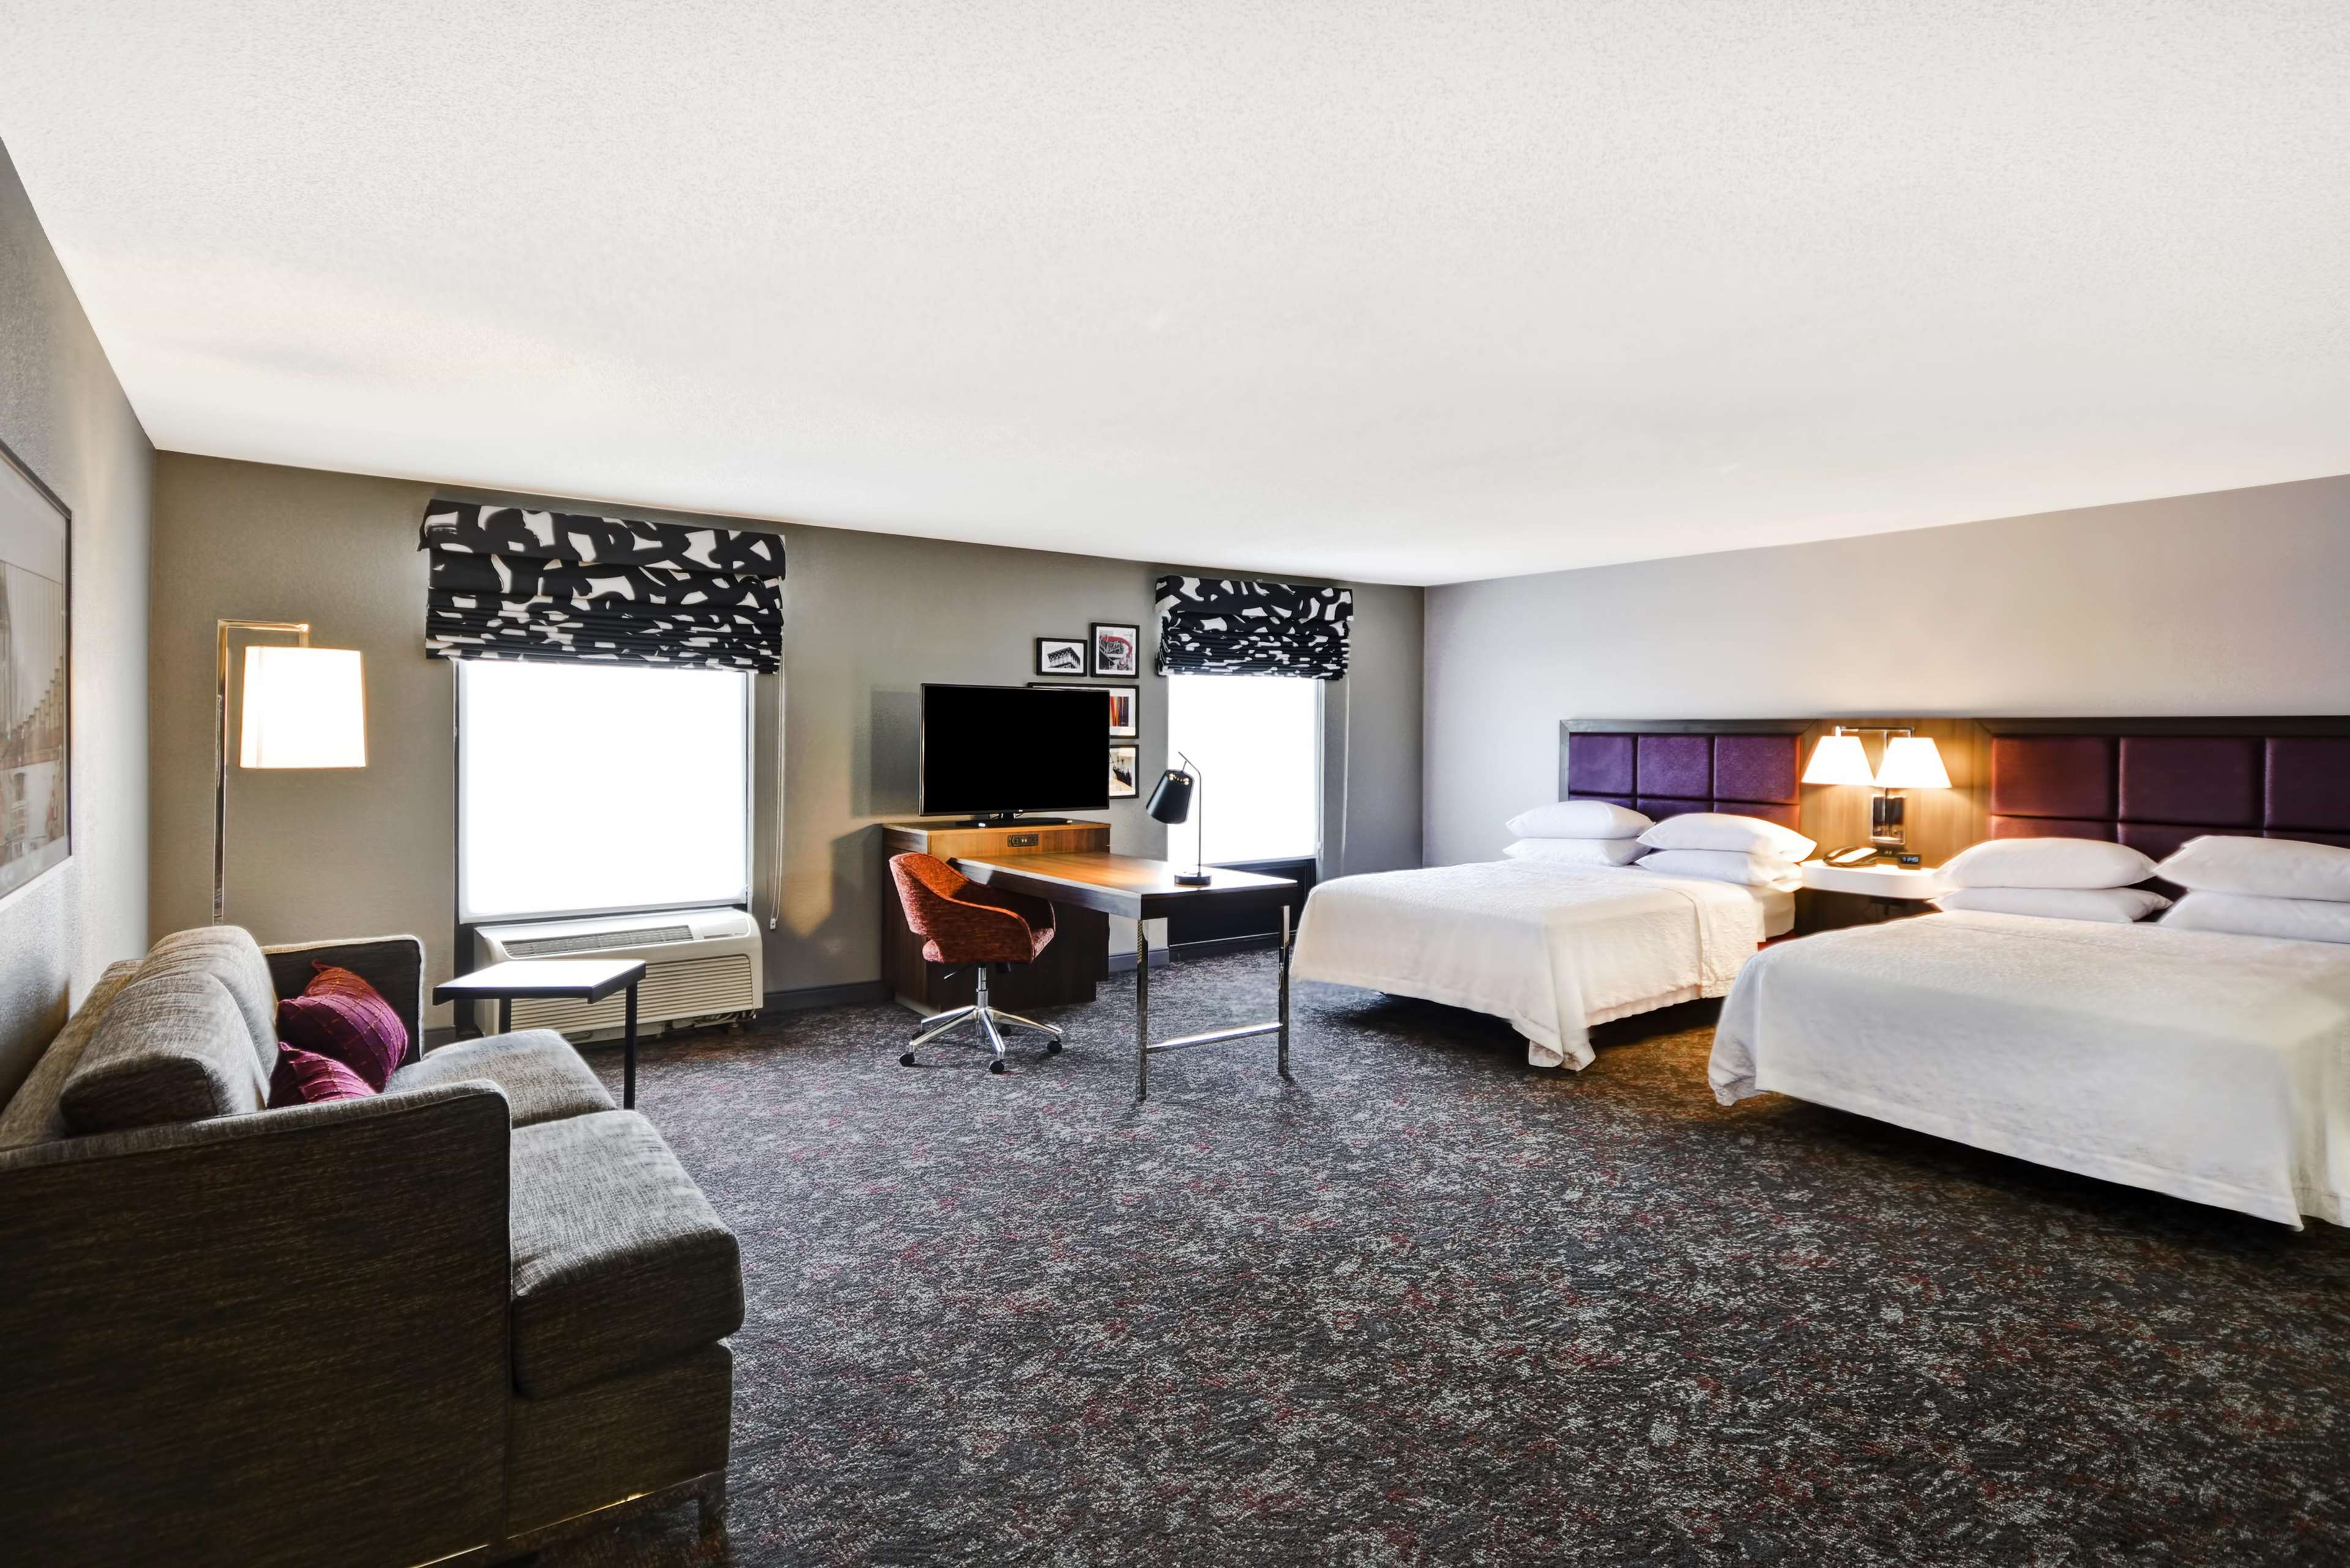 Hampton Inn & Suites Columbus-Easton Area image 44